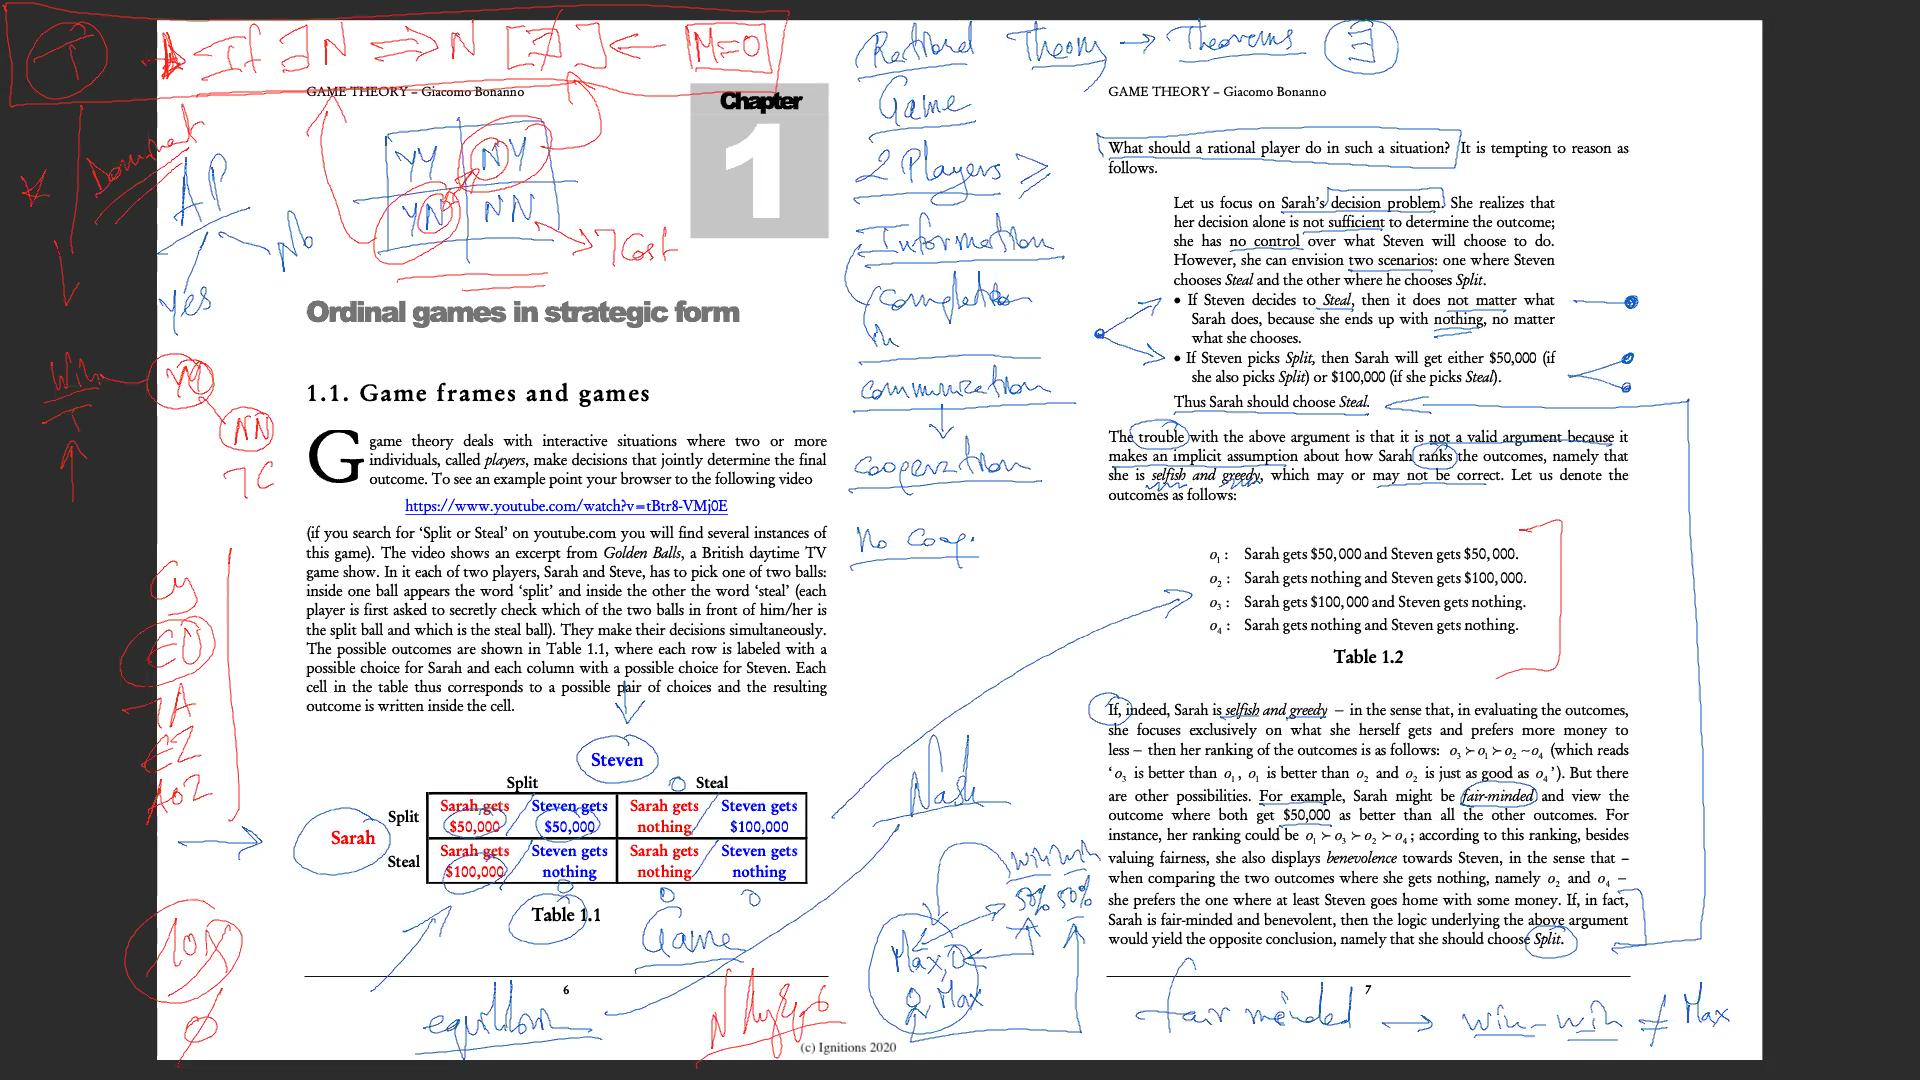 56962 - e-Μάθημα: Game Theory. (Dessin)